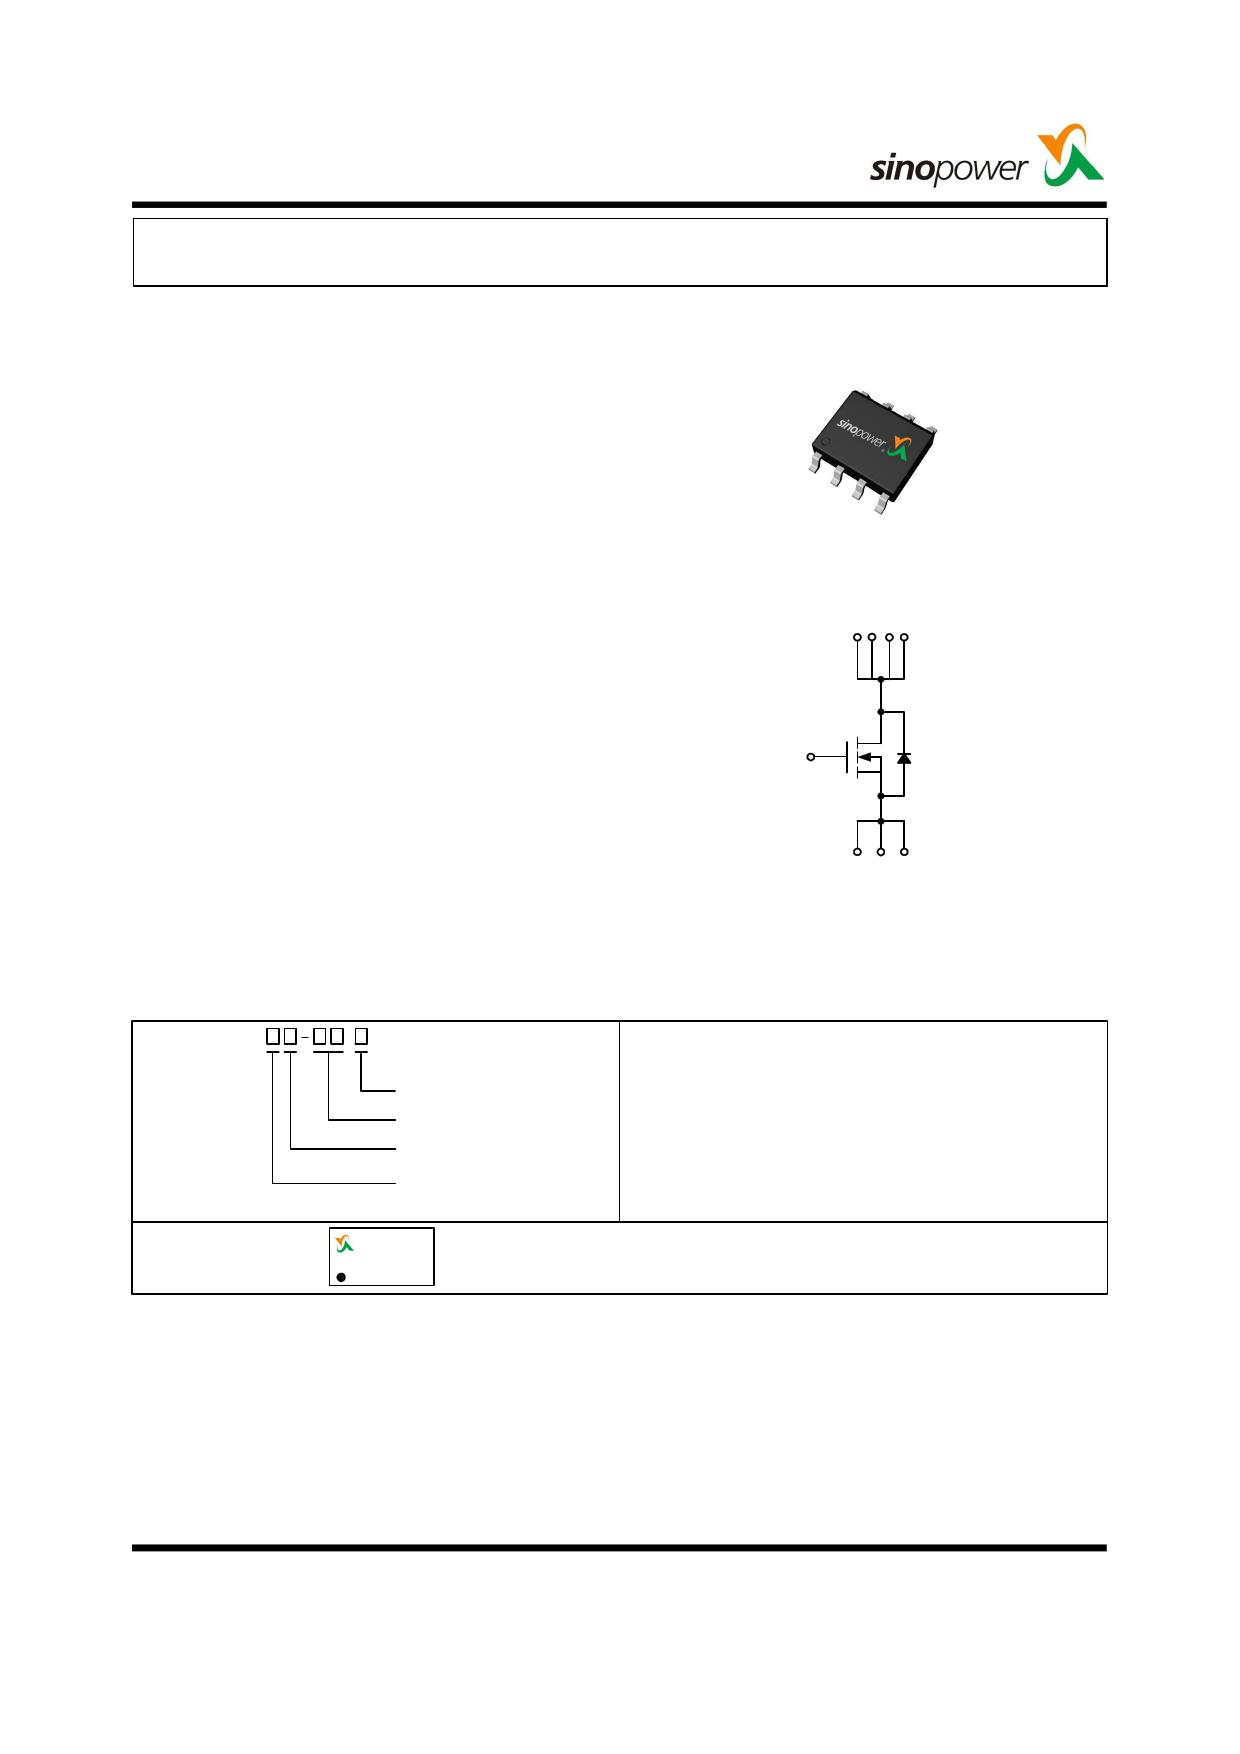 SM8008NSK datasheet pinout pdf